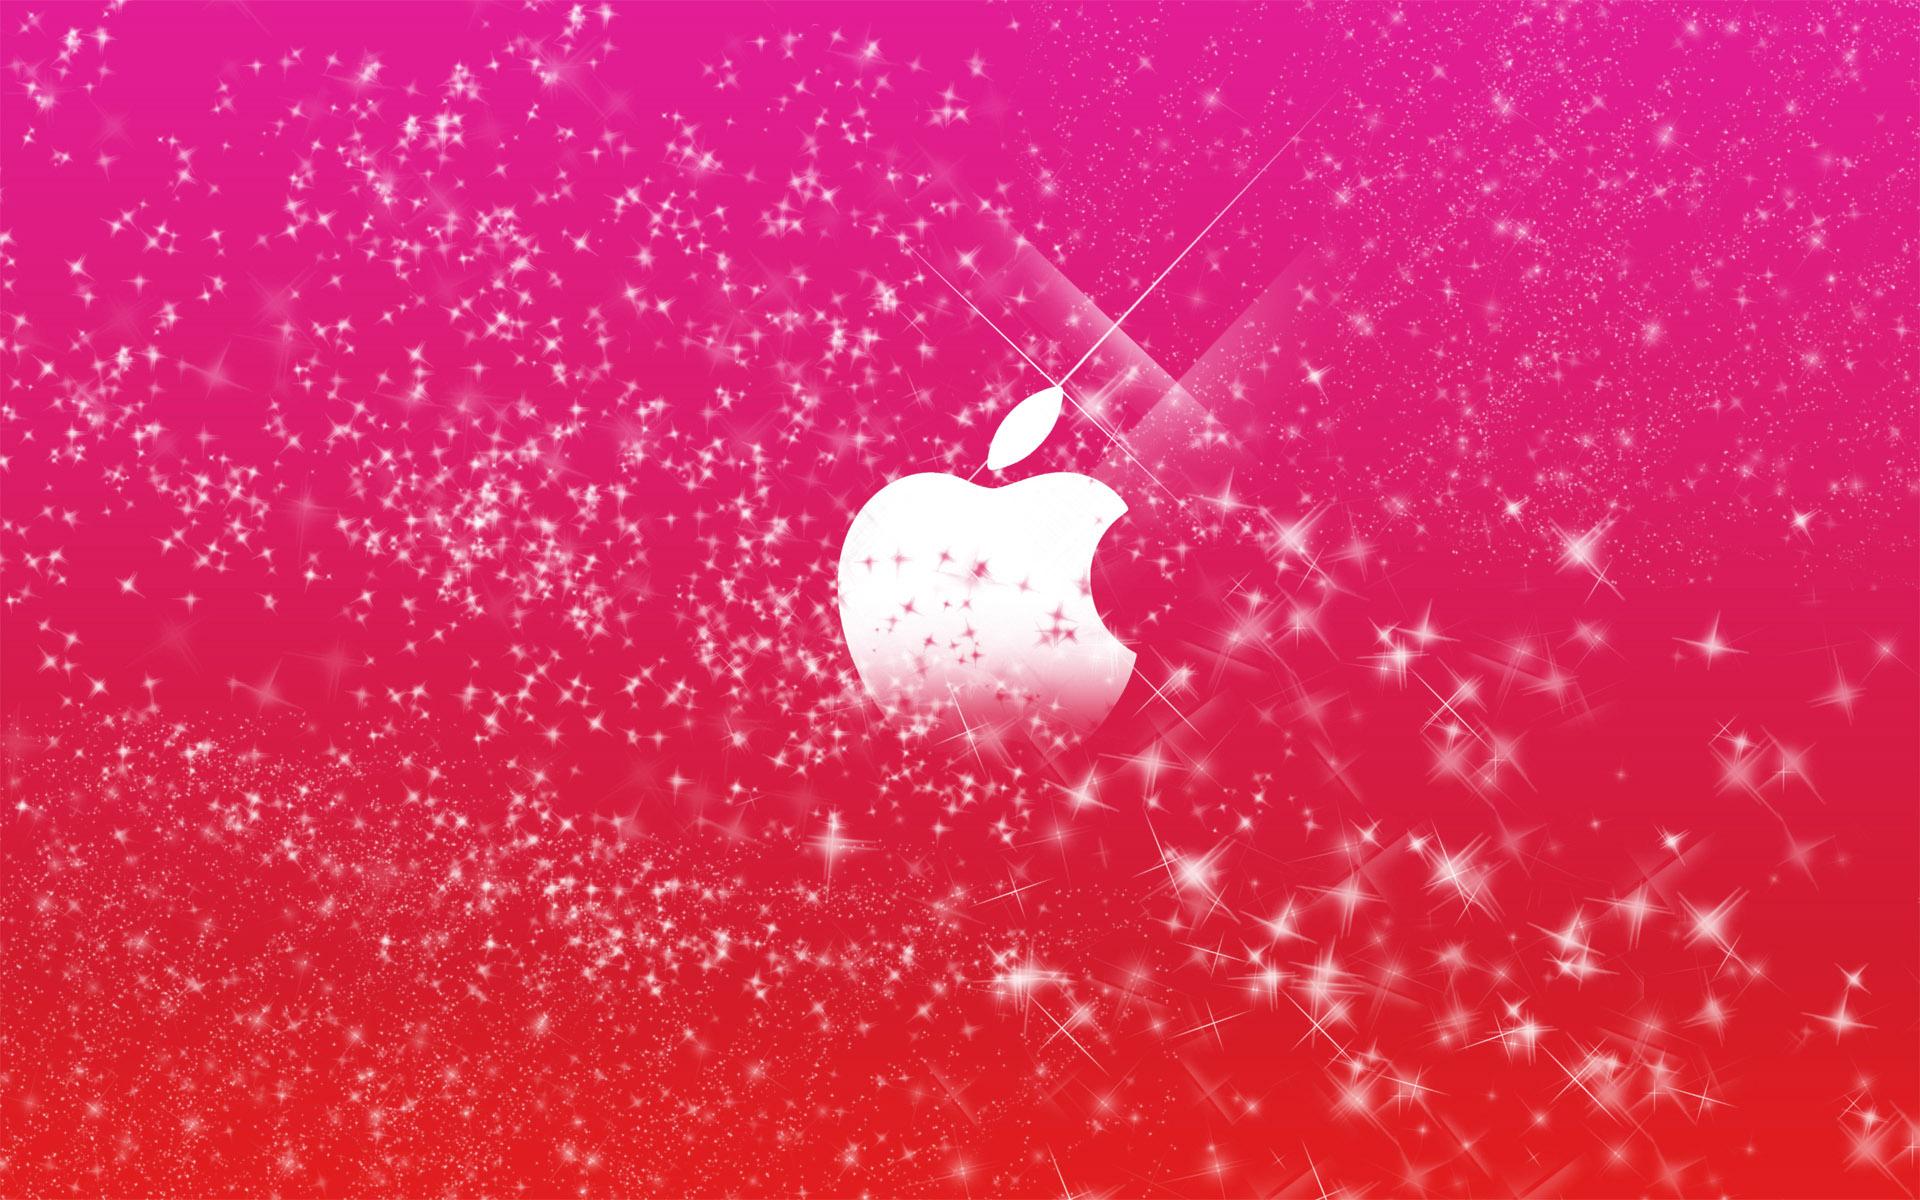 Apple Logo in Pink Glitters Wallpapers HD Wallpapers 1920x1200